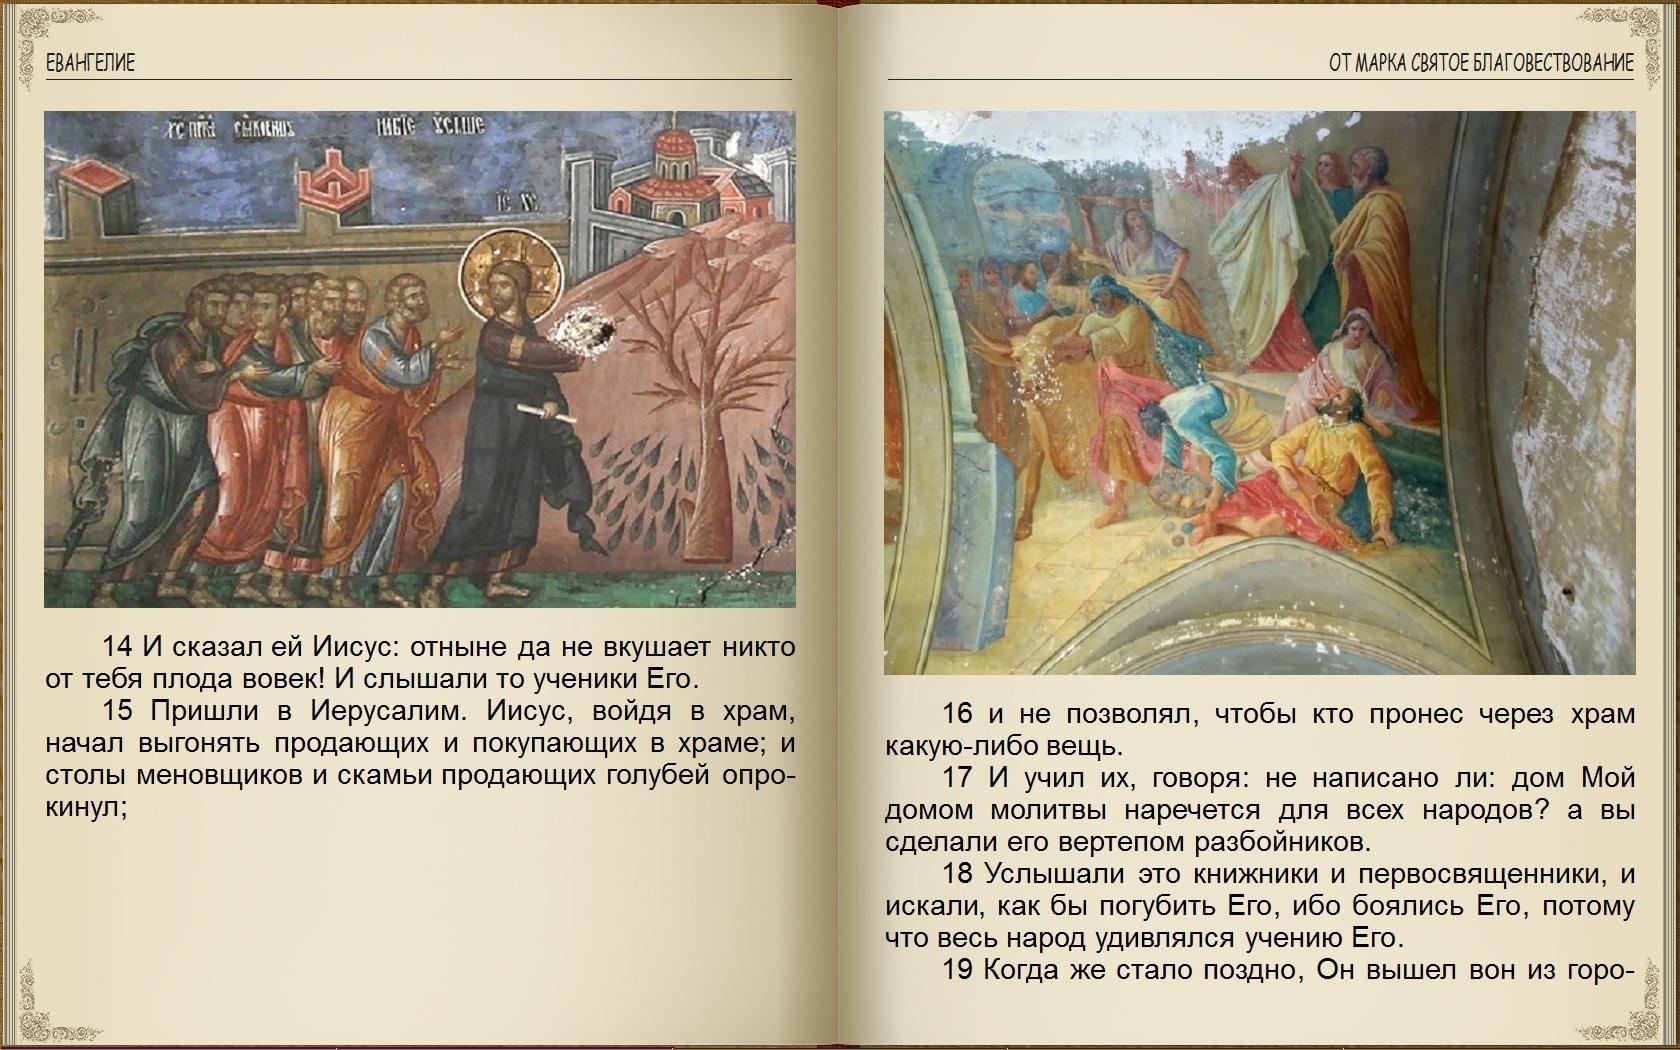 http://i3.imageban.ru/out/2014/01/09/118f4339a62a8589b29a0c1c9153df39.jpg